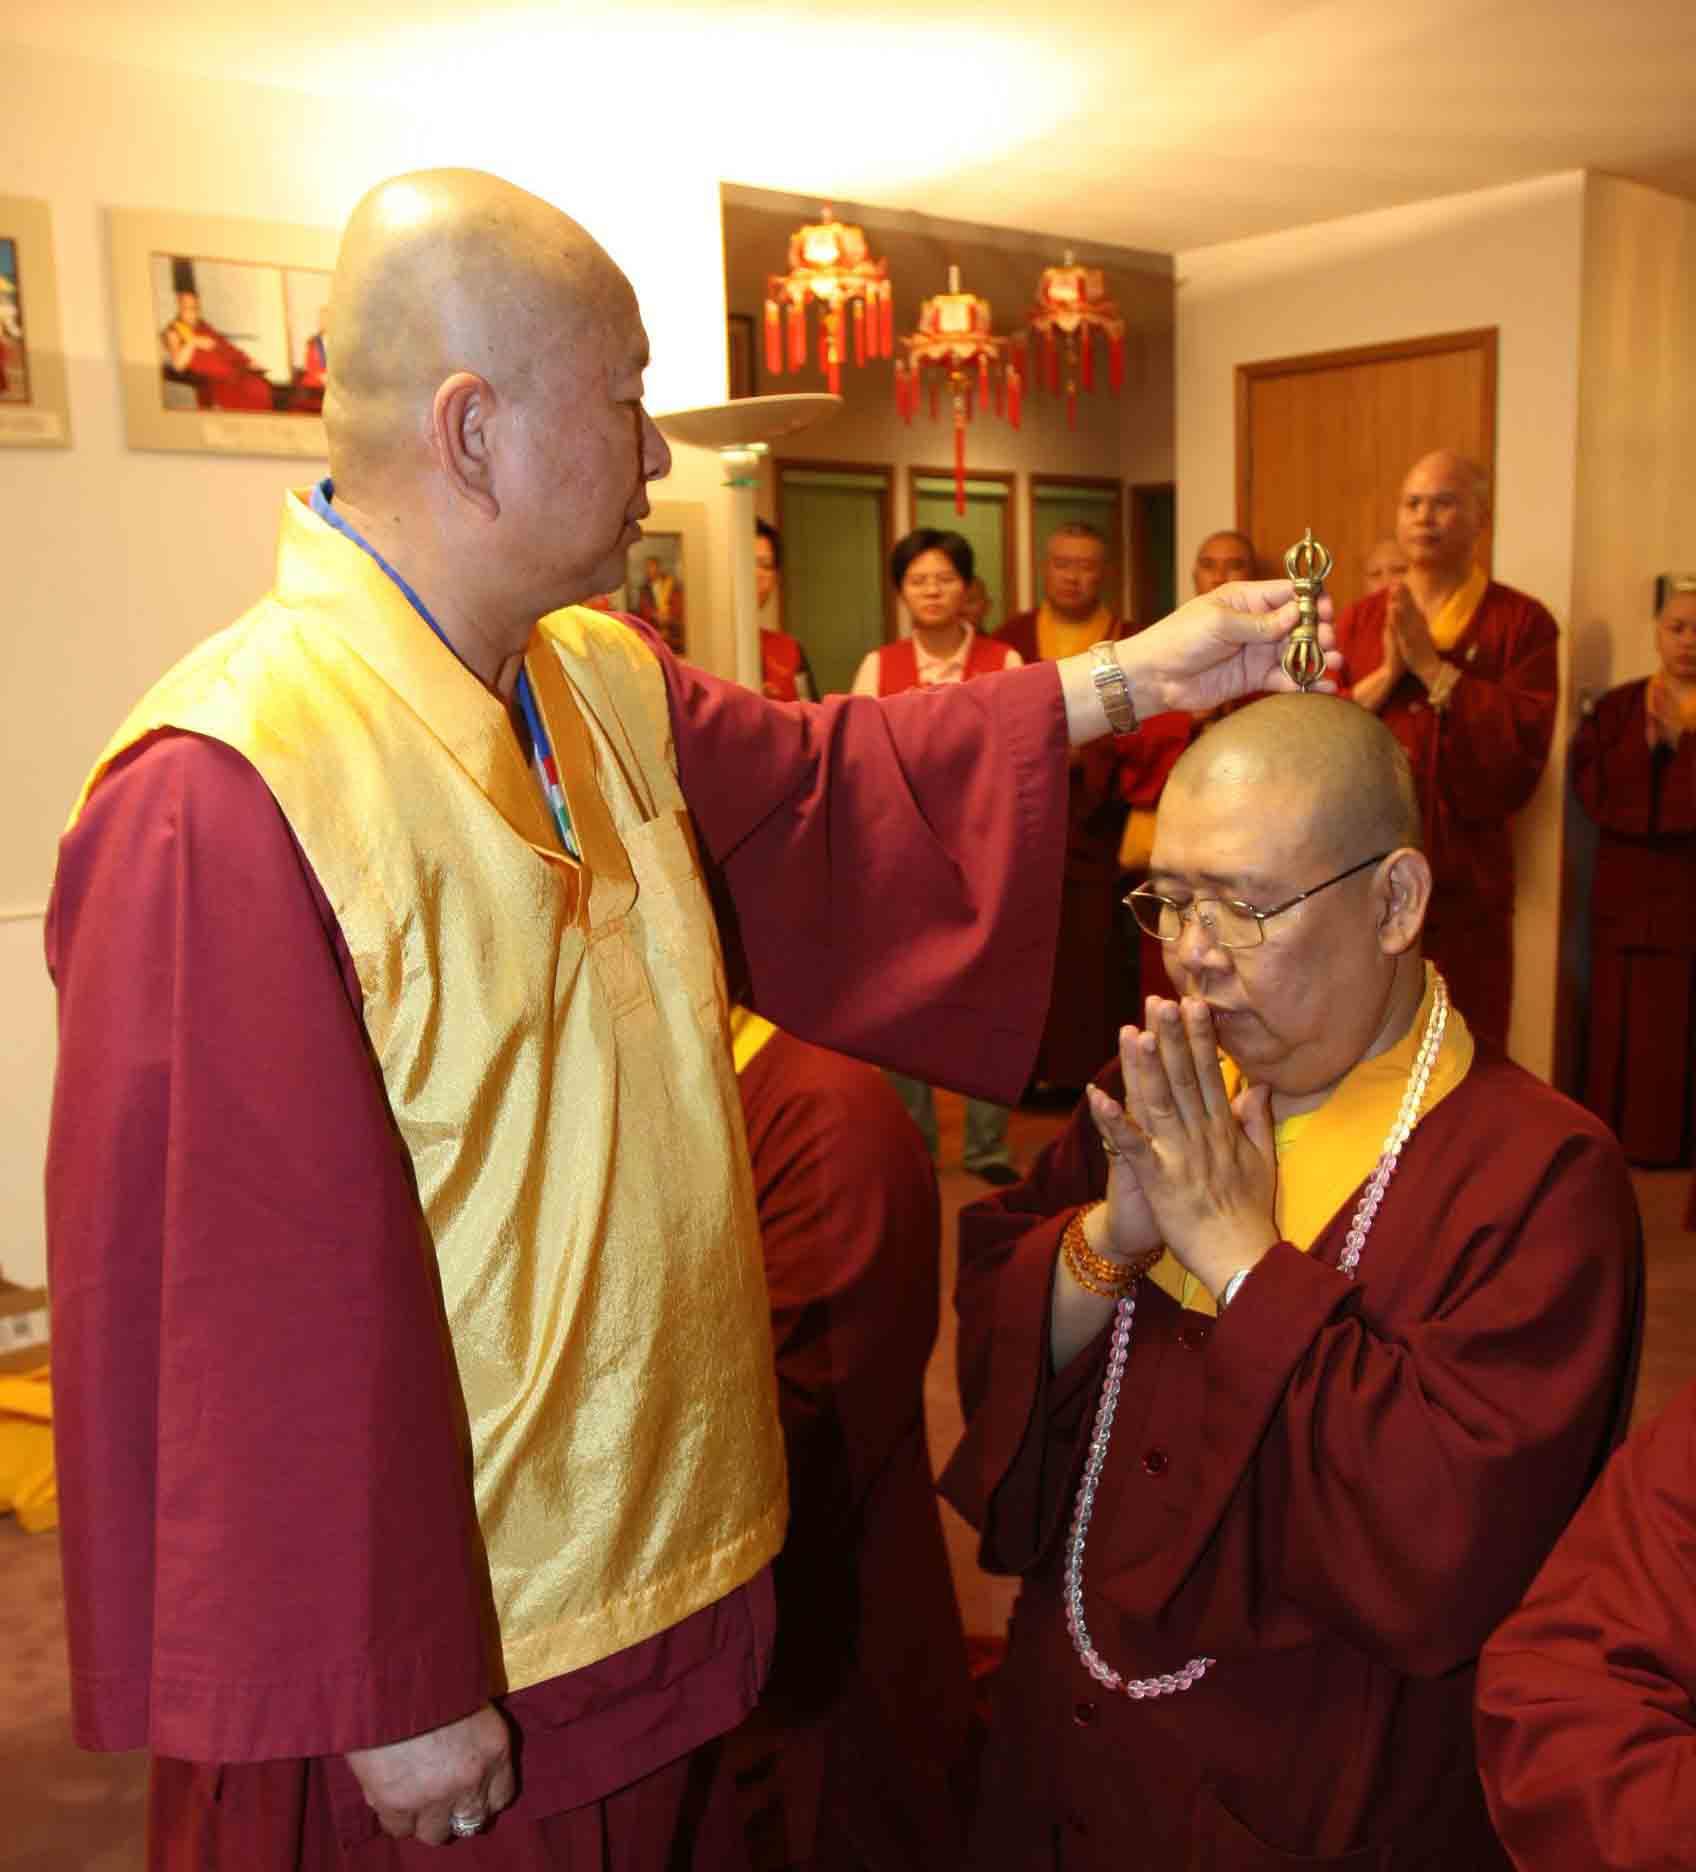 Grand Master Lu memberikan abhiseka vajra acarya kepada Master Lian Yuan